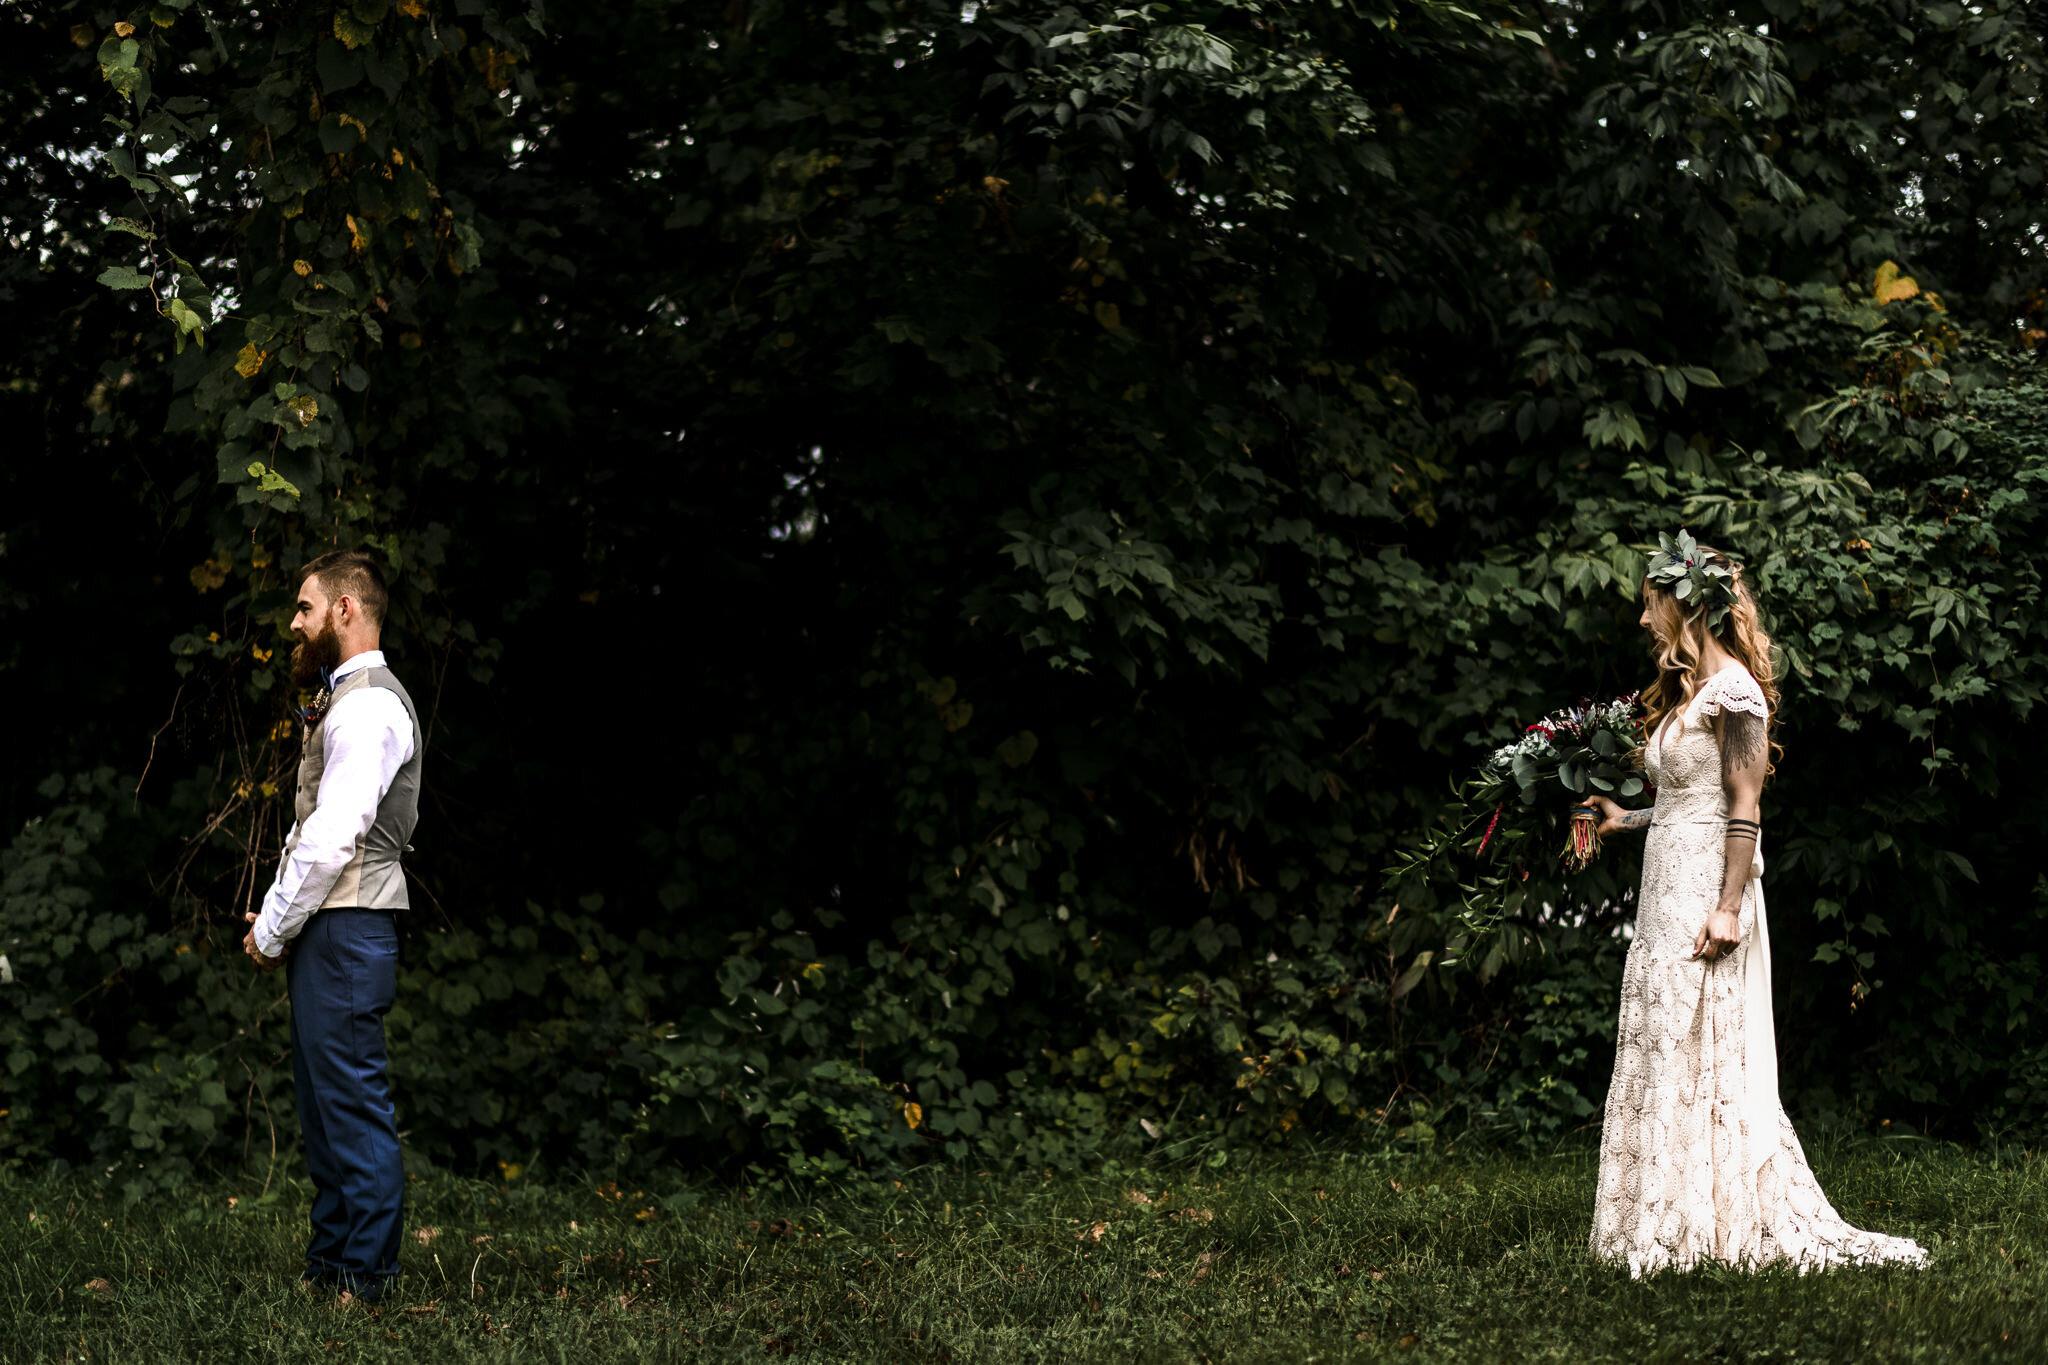 Hoffman-618-New-Jersey-Wedding-Photographer-15.JPG